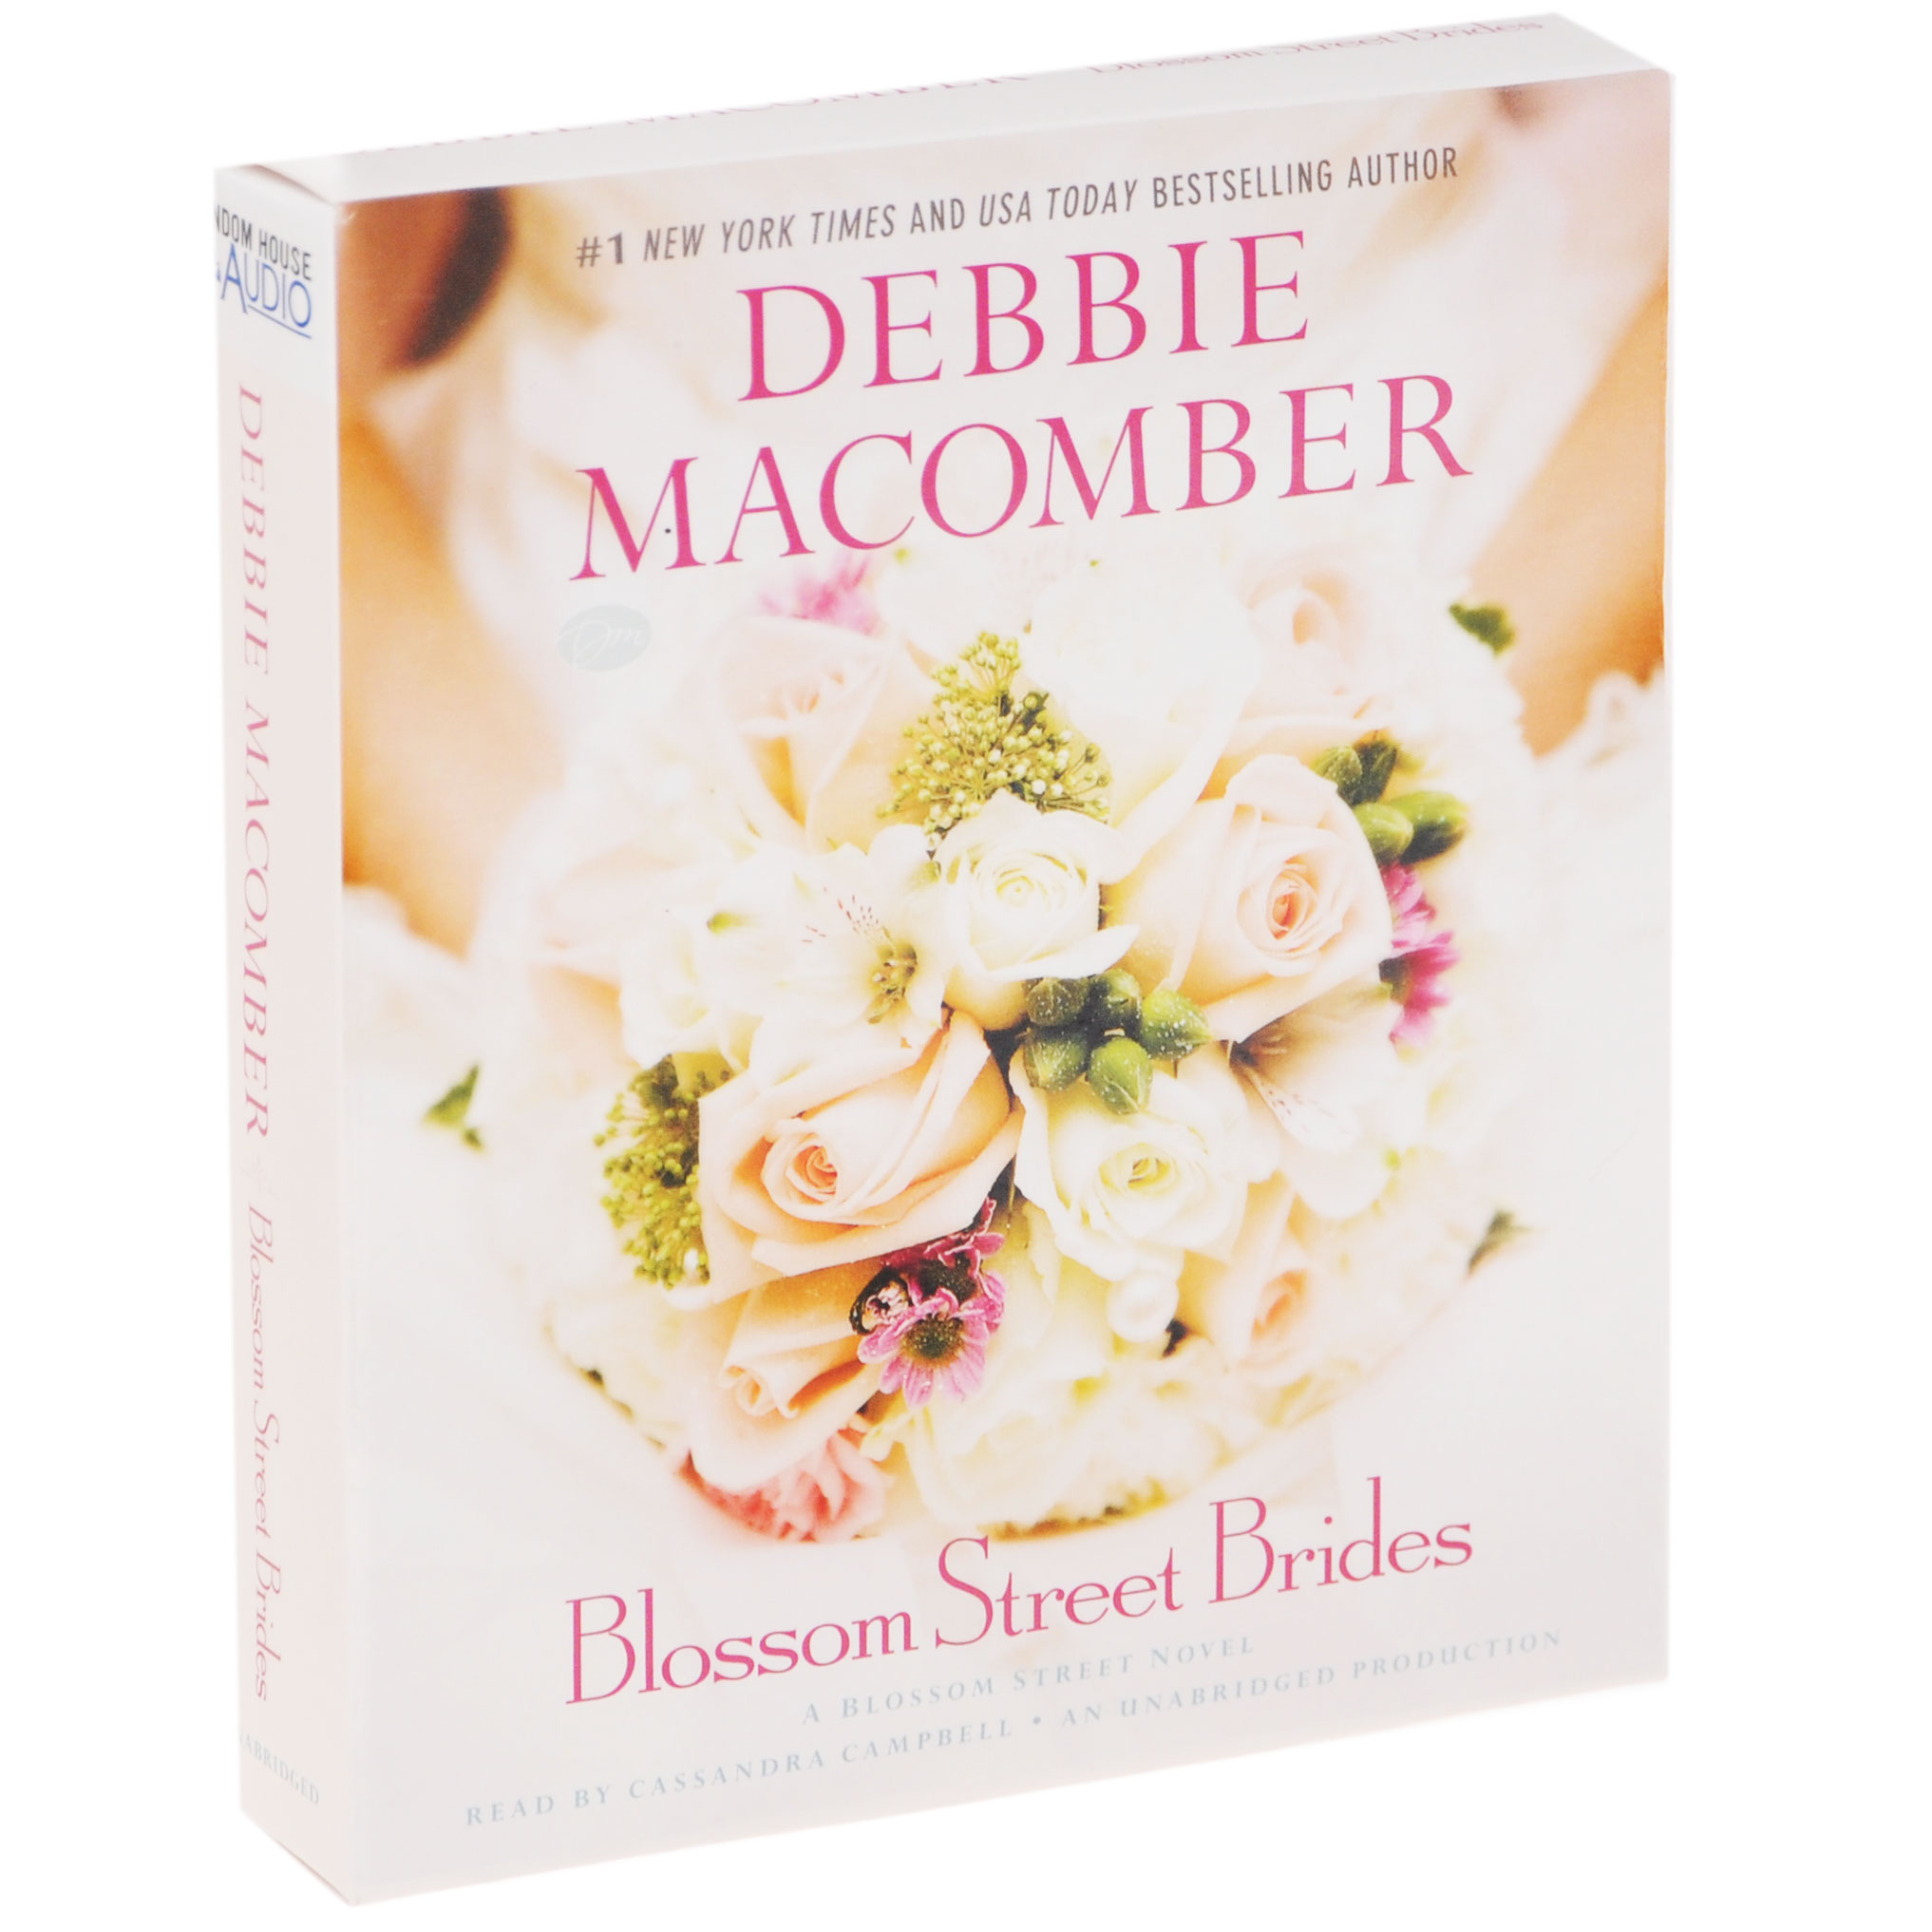 Blossom Street Brides (аудиокнига на 9 CD)